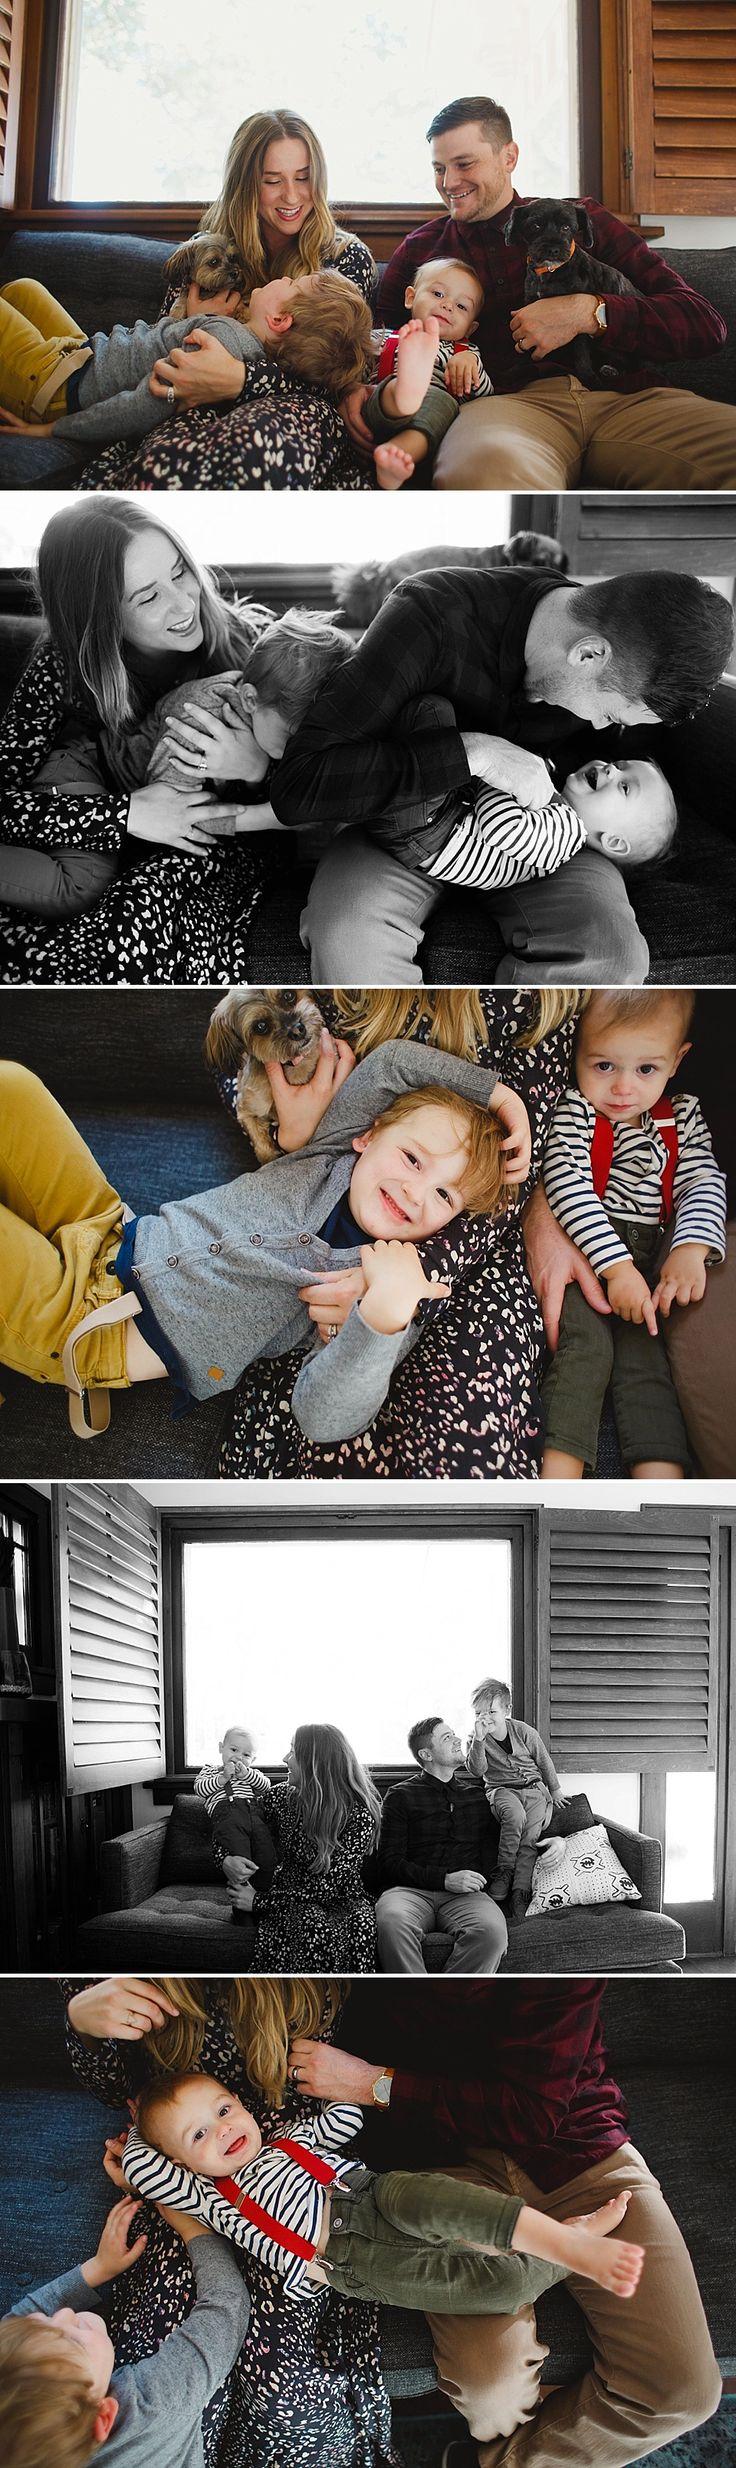 © Summer Murdock | Photographer Salt Lake City Area Family Photographer Lifestyle In Home session